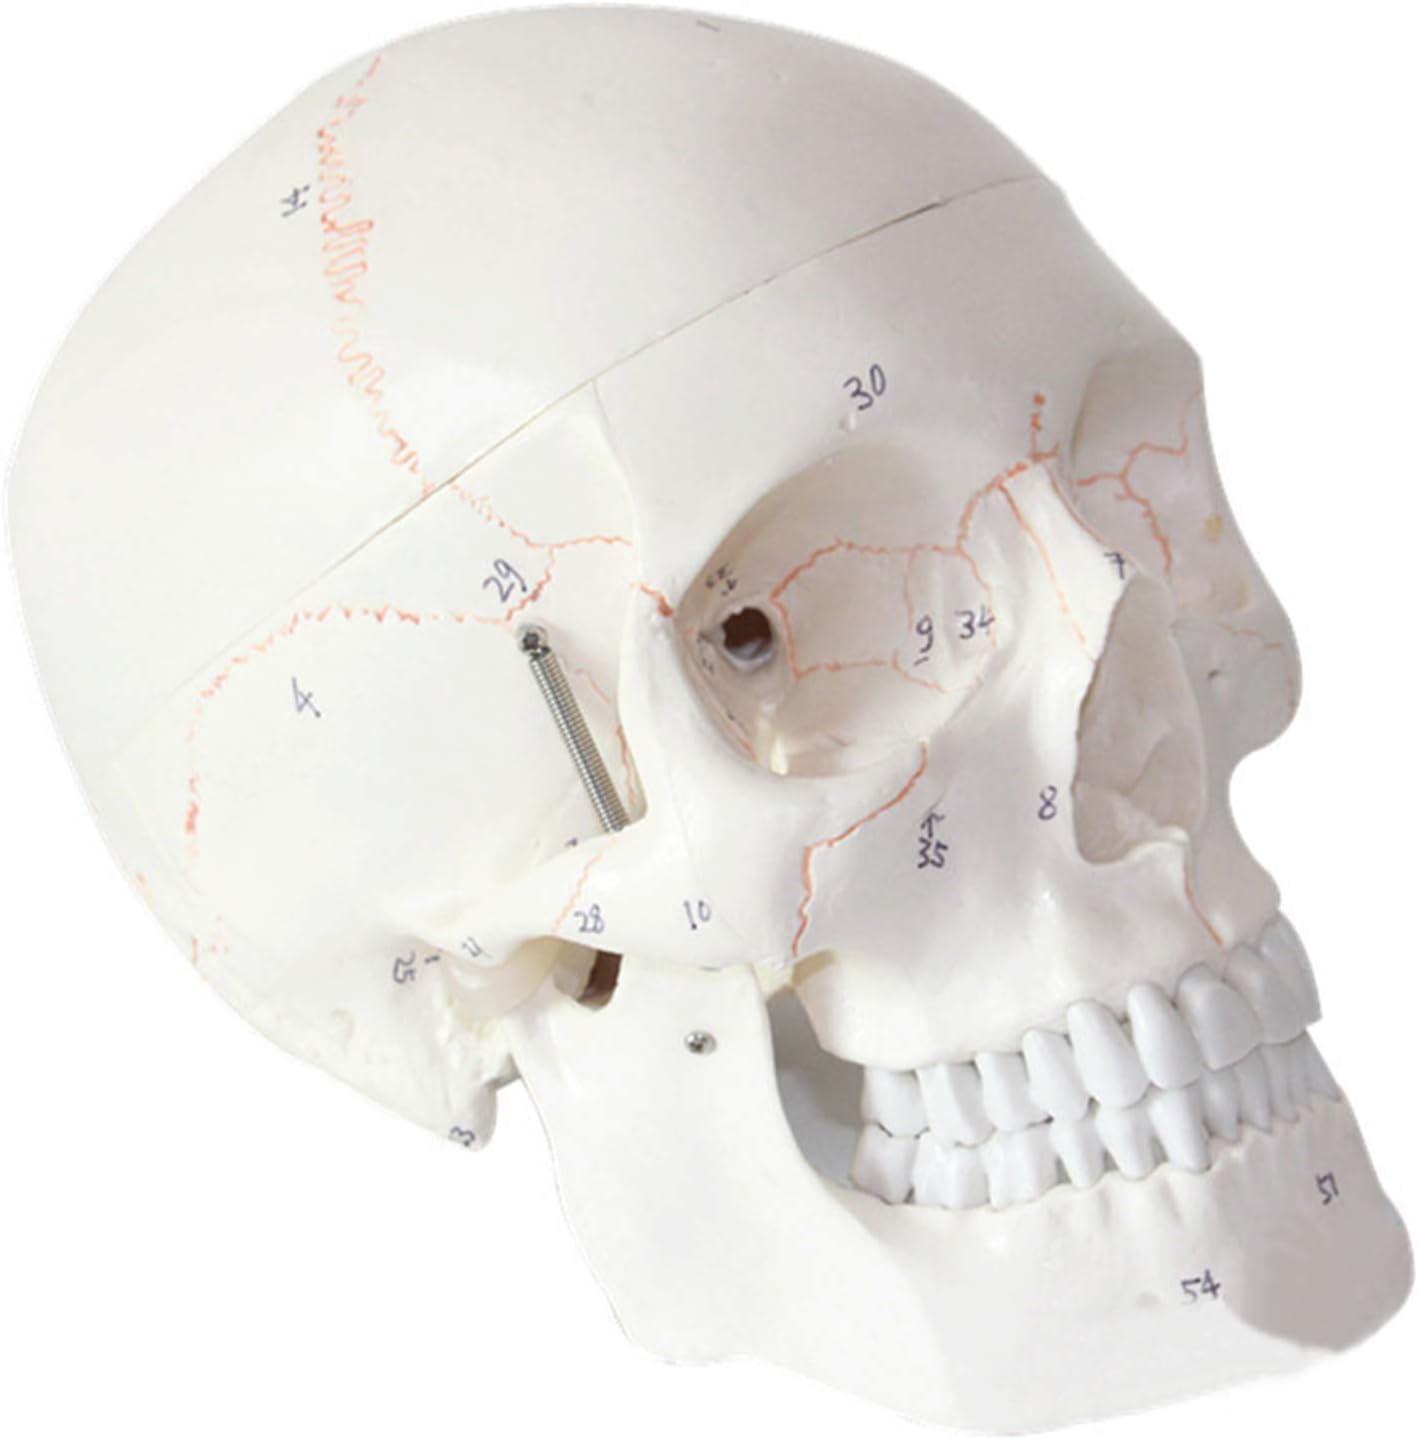 EnweMahi Human Skull Model with Digital Mo Large discharge Shipping included sale Logo Detachable